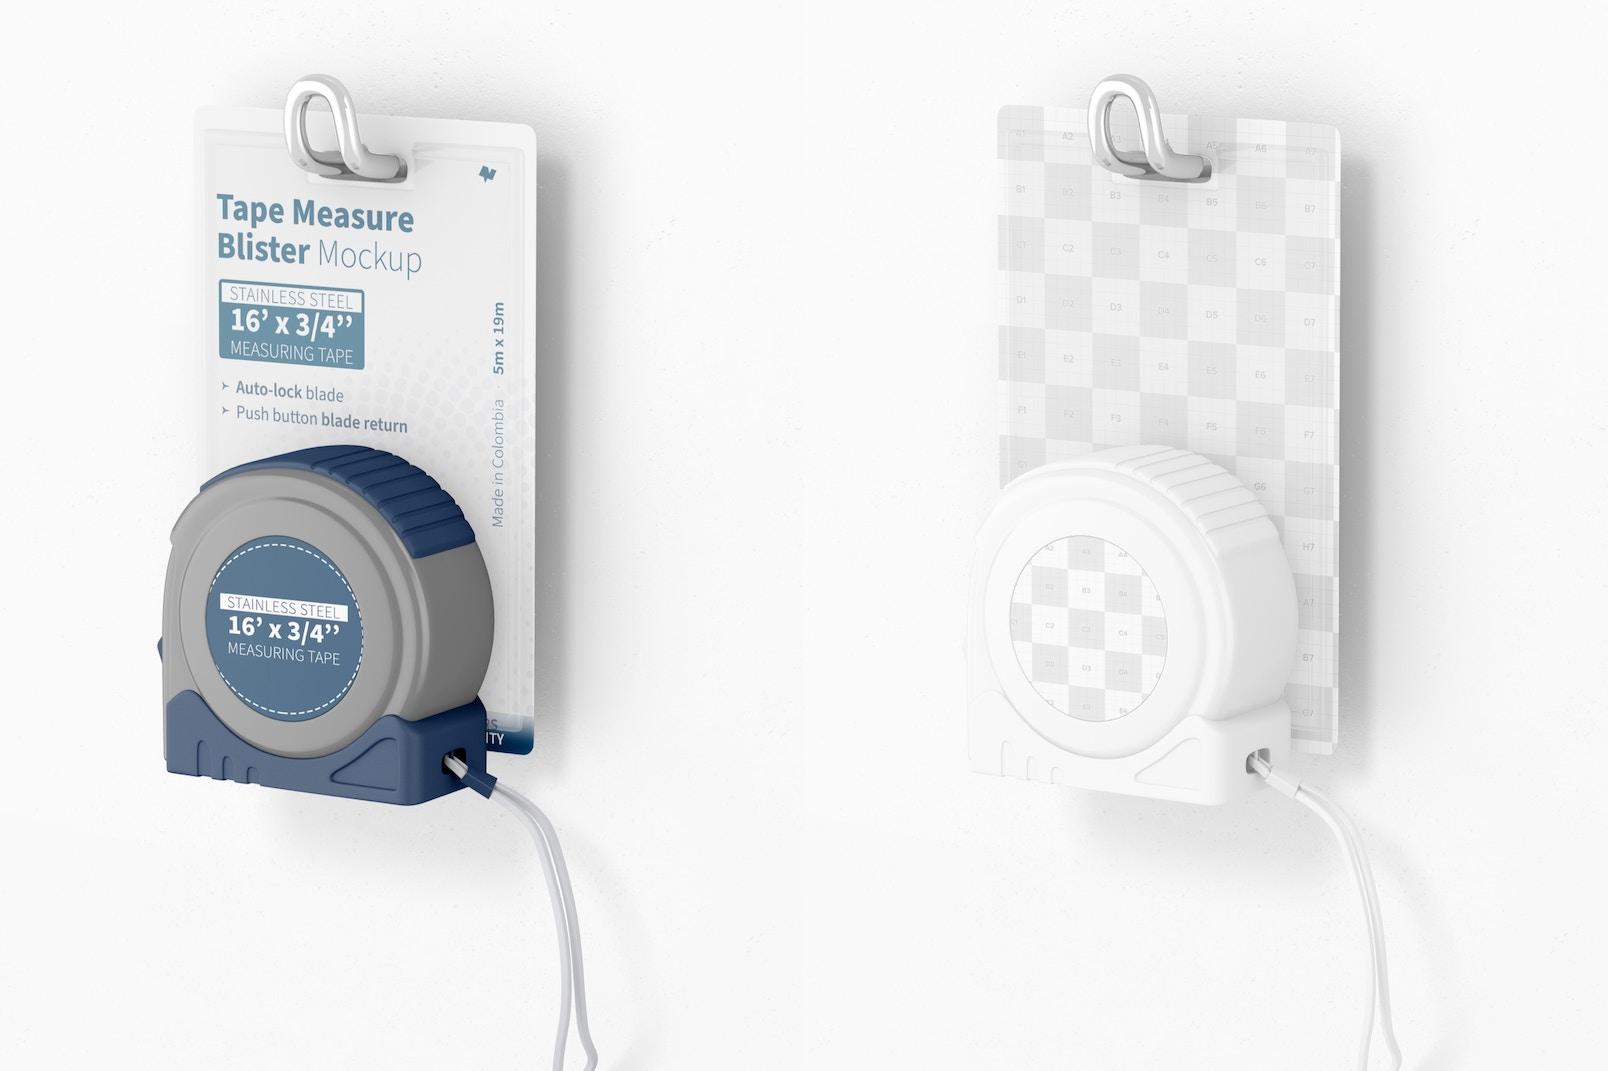 Tape Measure Blister Mockup, Hanging